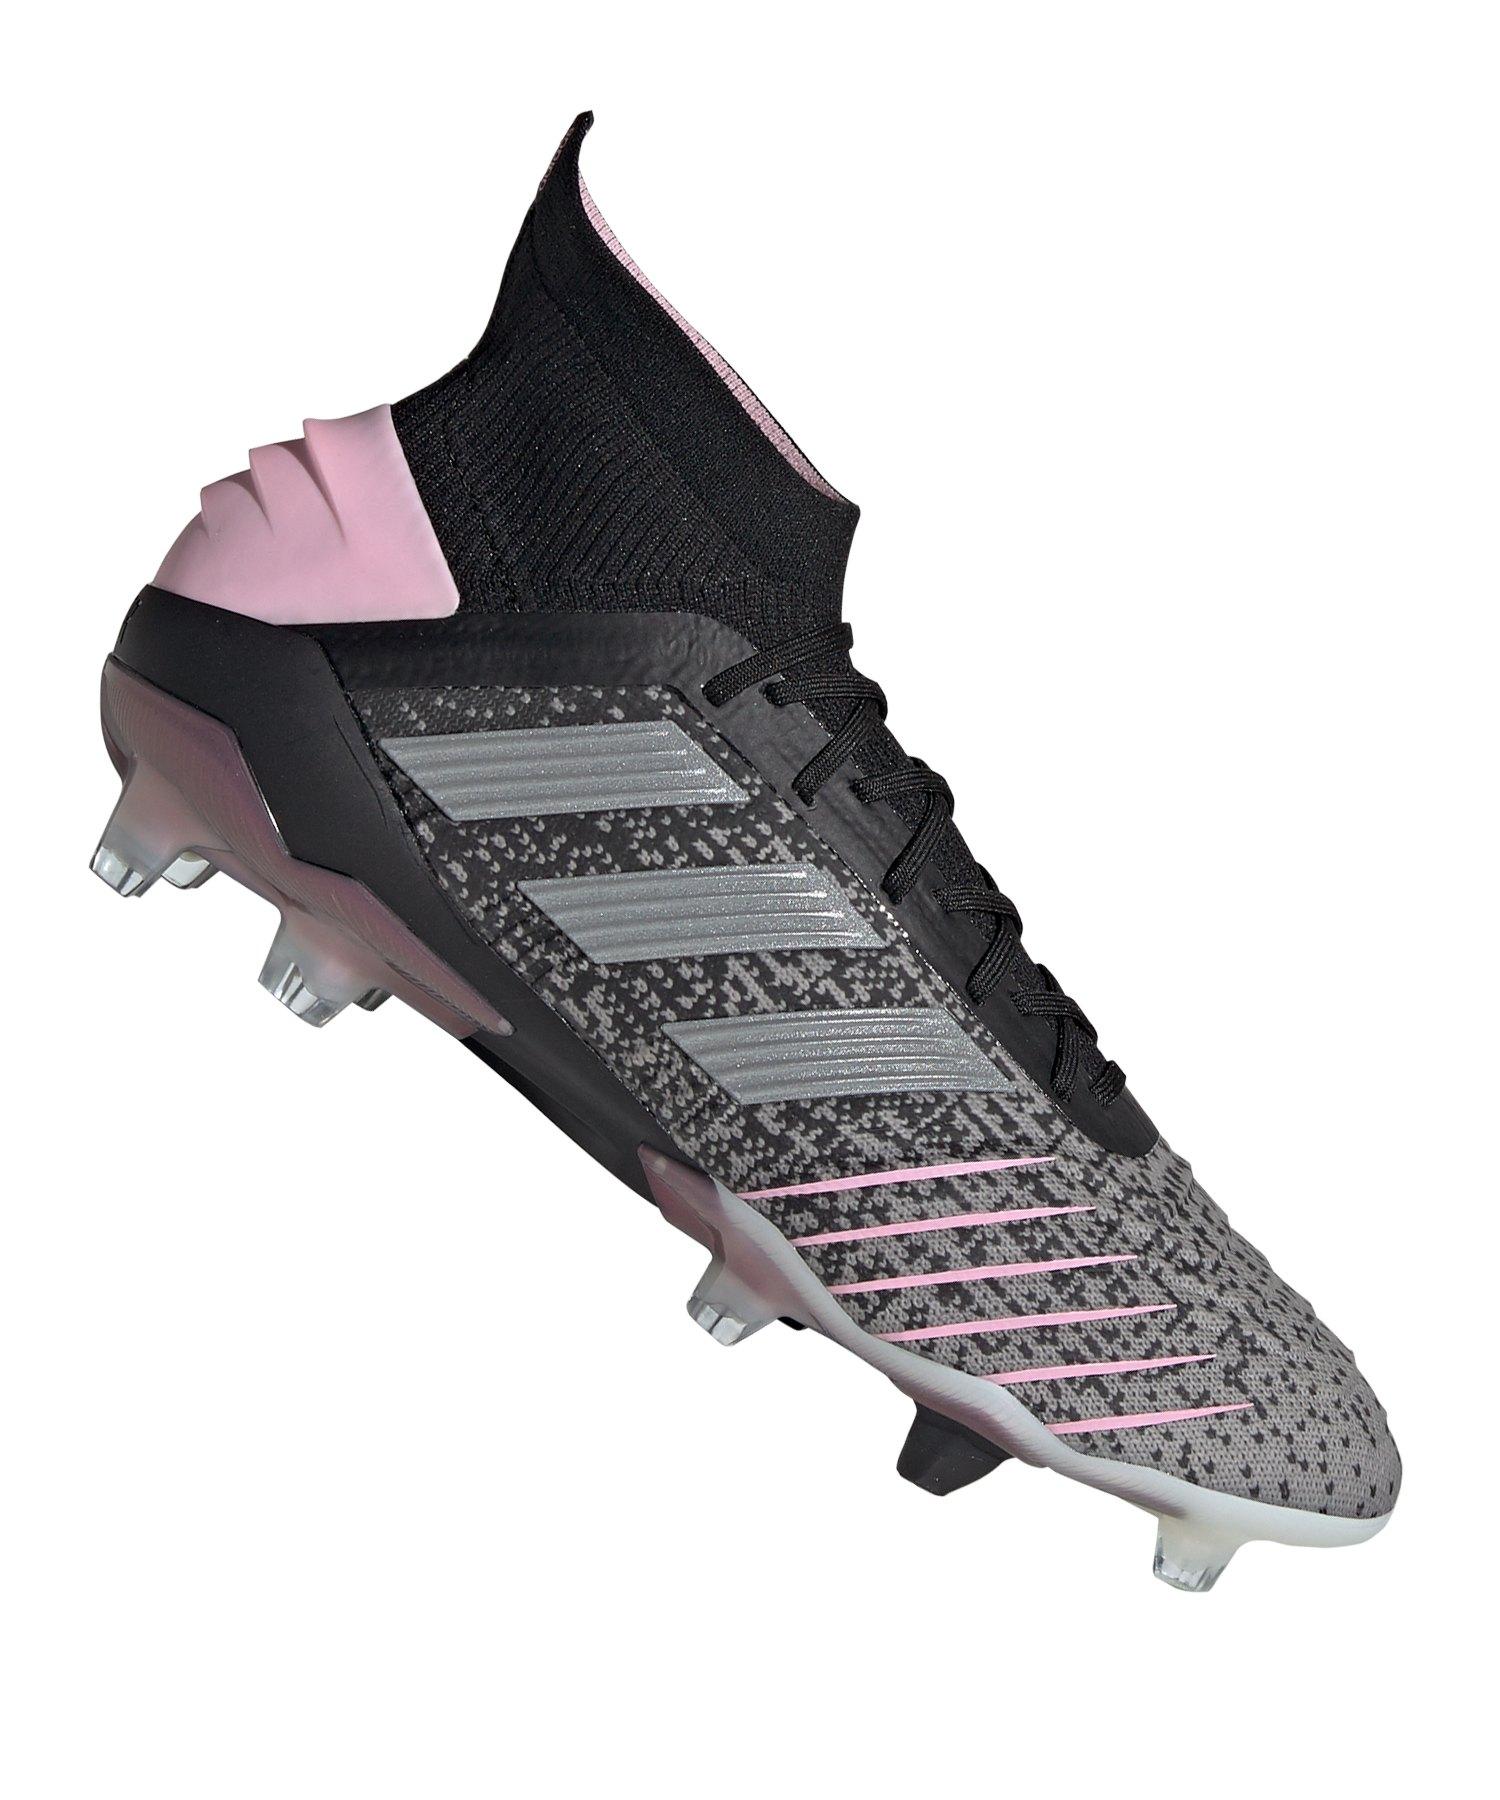 new york 2f4c4 f3e53 adidas Predator 19.1 FG Damen Schwarz Pink - schwarz